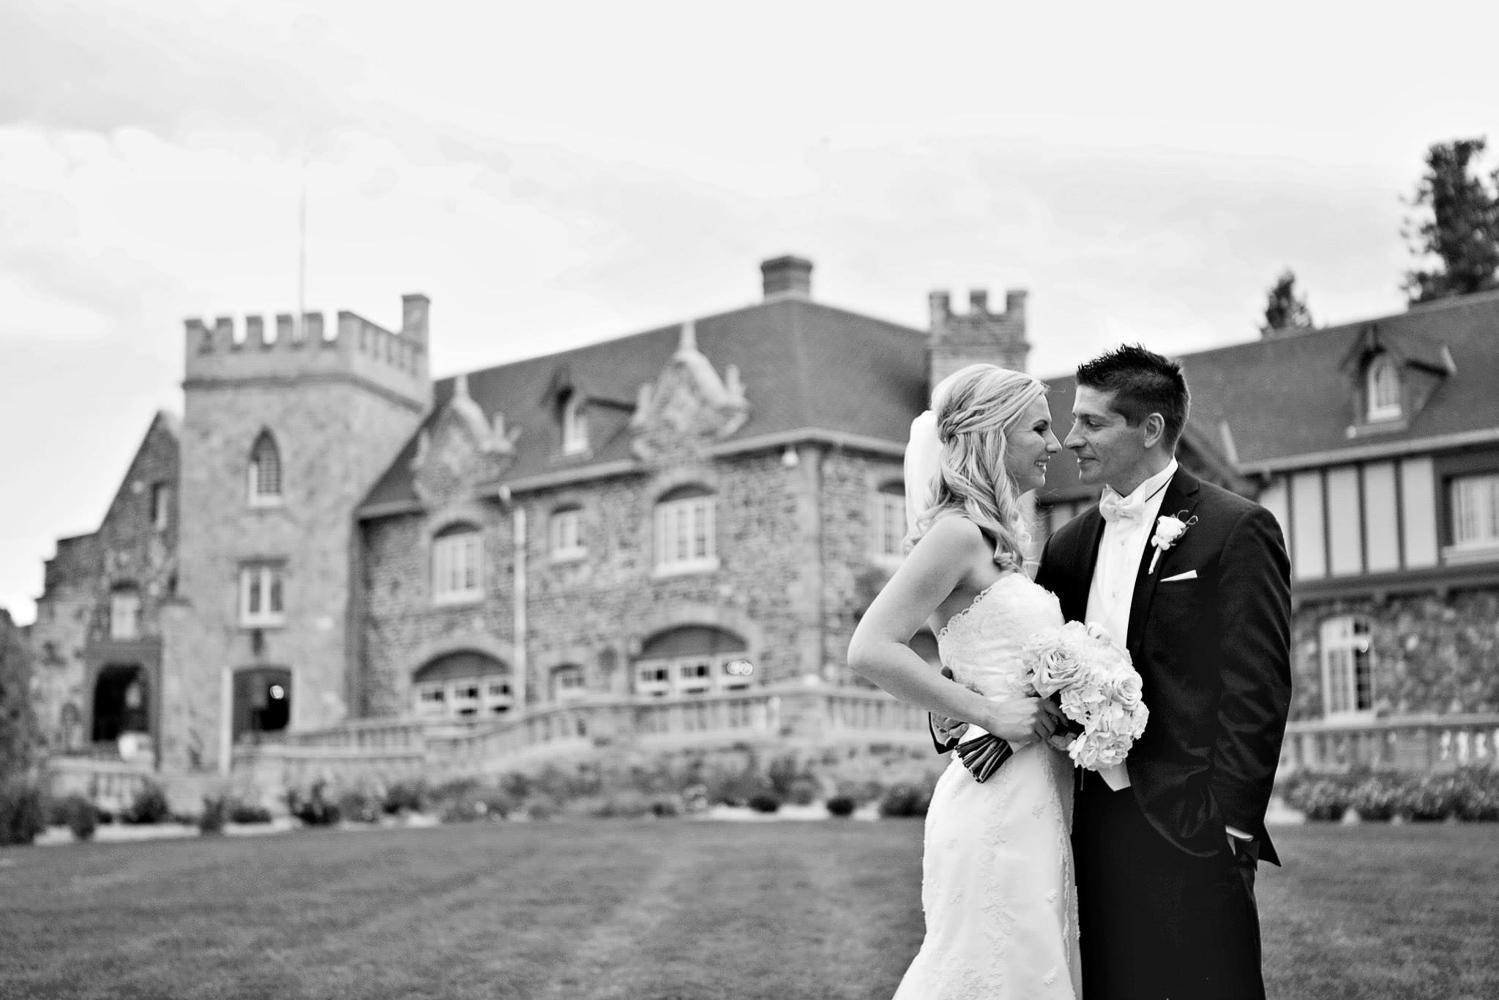 JMPHOTOART-Wedding-Photographer-125.jpg